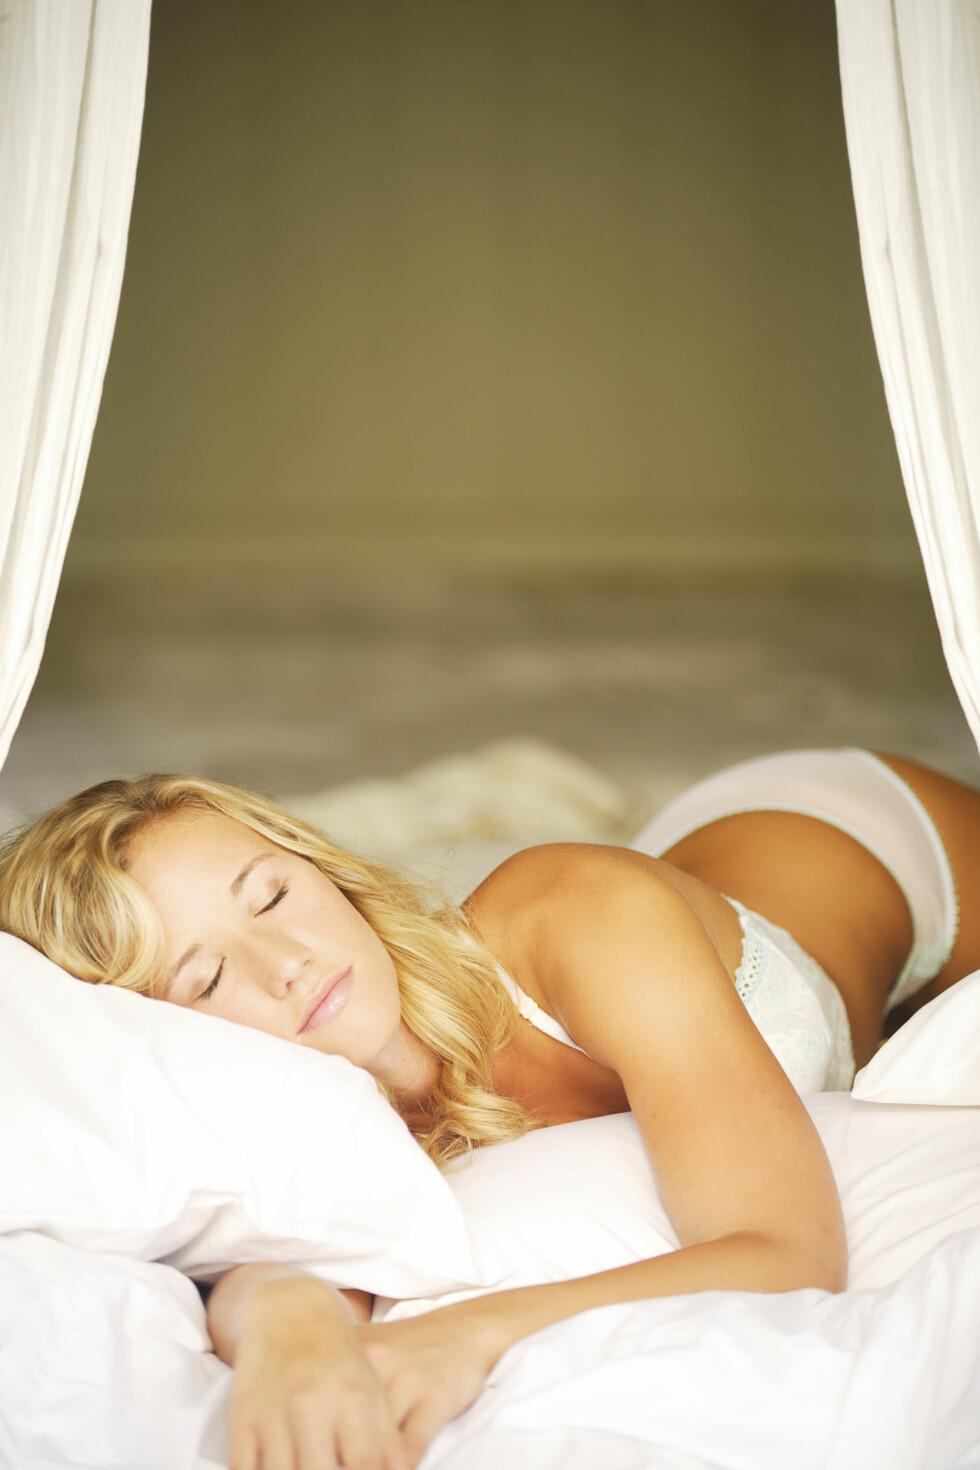 SØVN: Folk med lavt stoffskifte føler ofte at de aldri får nok søvn. Foto: © Sri Rusden/Design Pics/Corbis